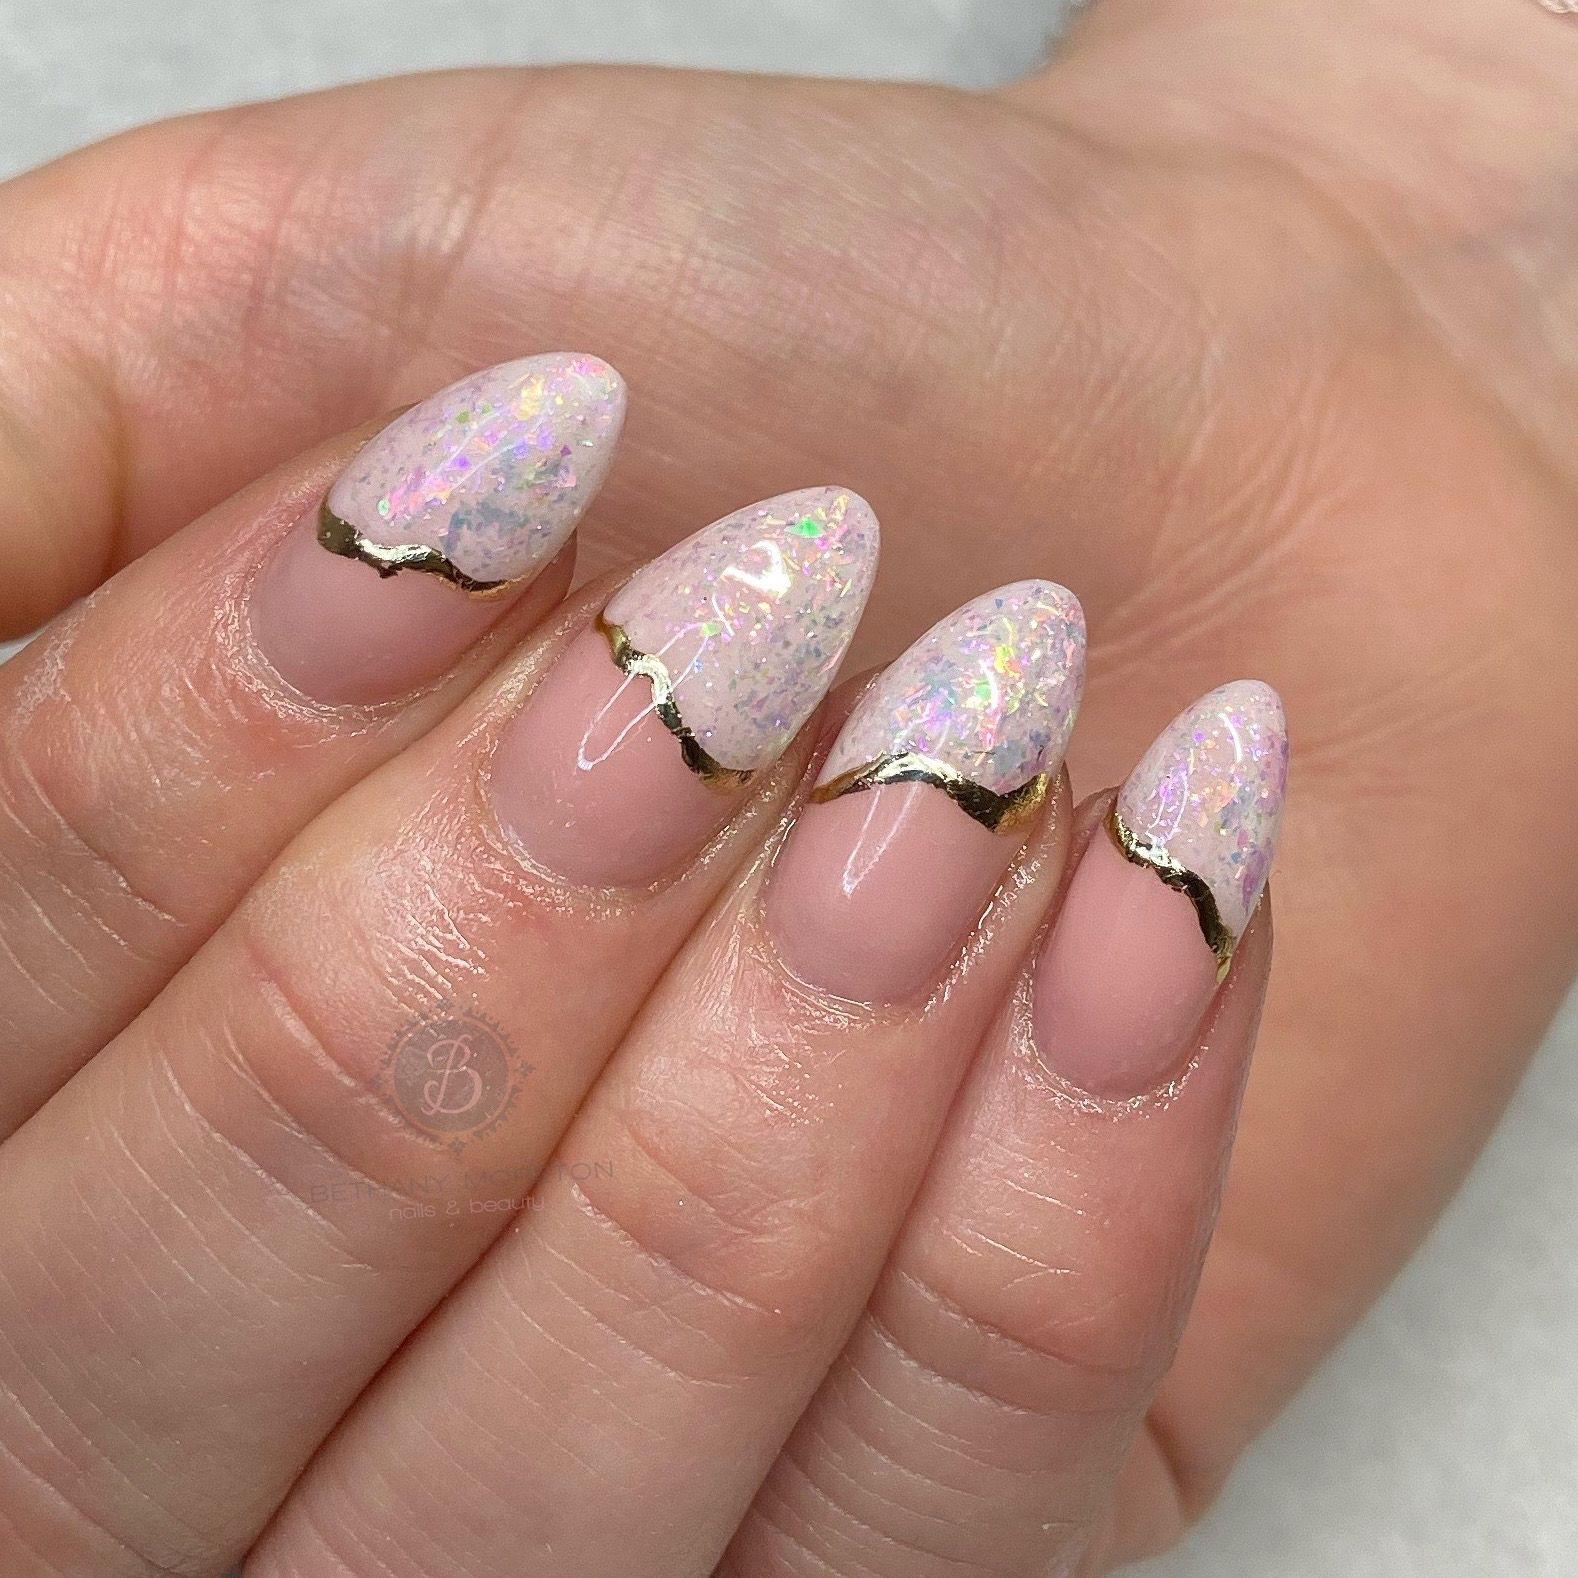 Milky pink Opal nails     #nails #thegelbottle #biab #nailtech #nailsbybeff #Staffordshire #biddulph #cheshire #nailart #love #fashion #nailtechnician #scratchmagazine  #nailaddict #nailpro #showscratch #polish #nailfie #nailartist